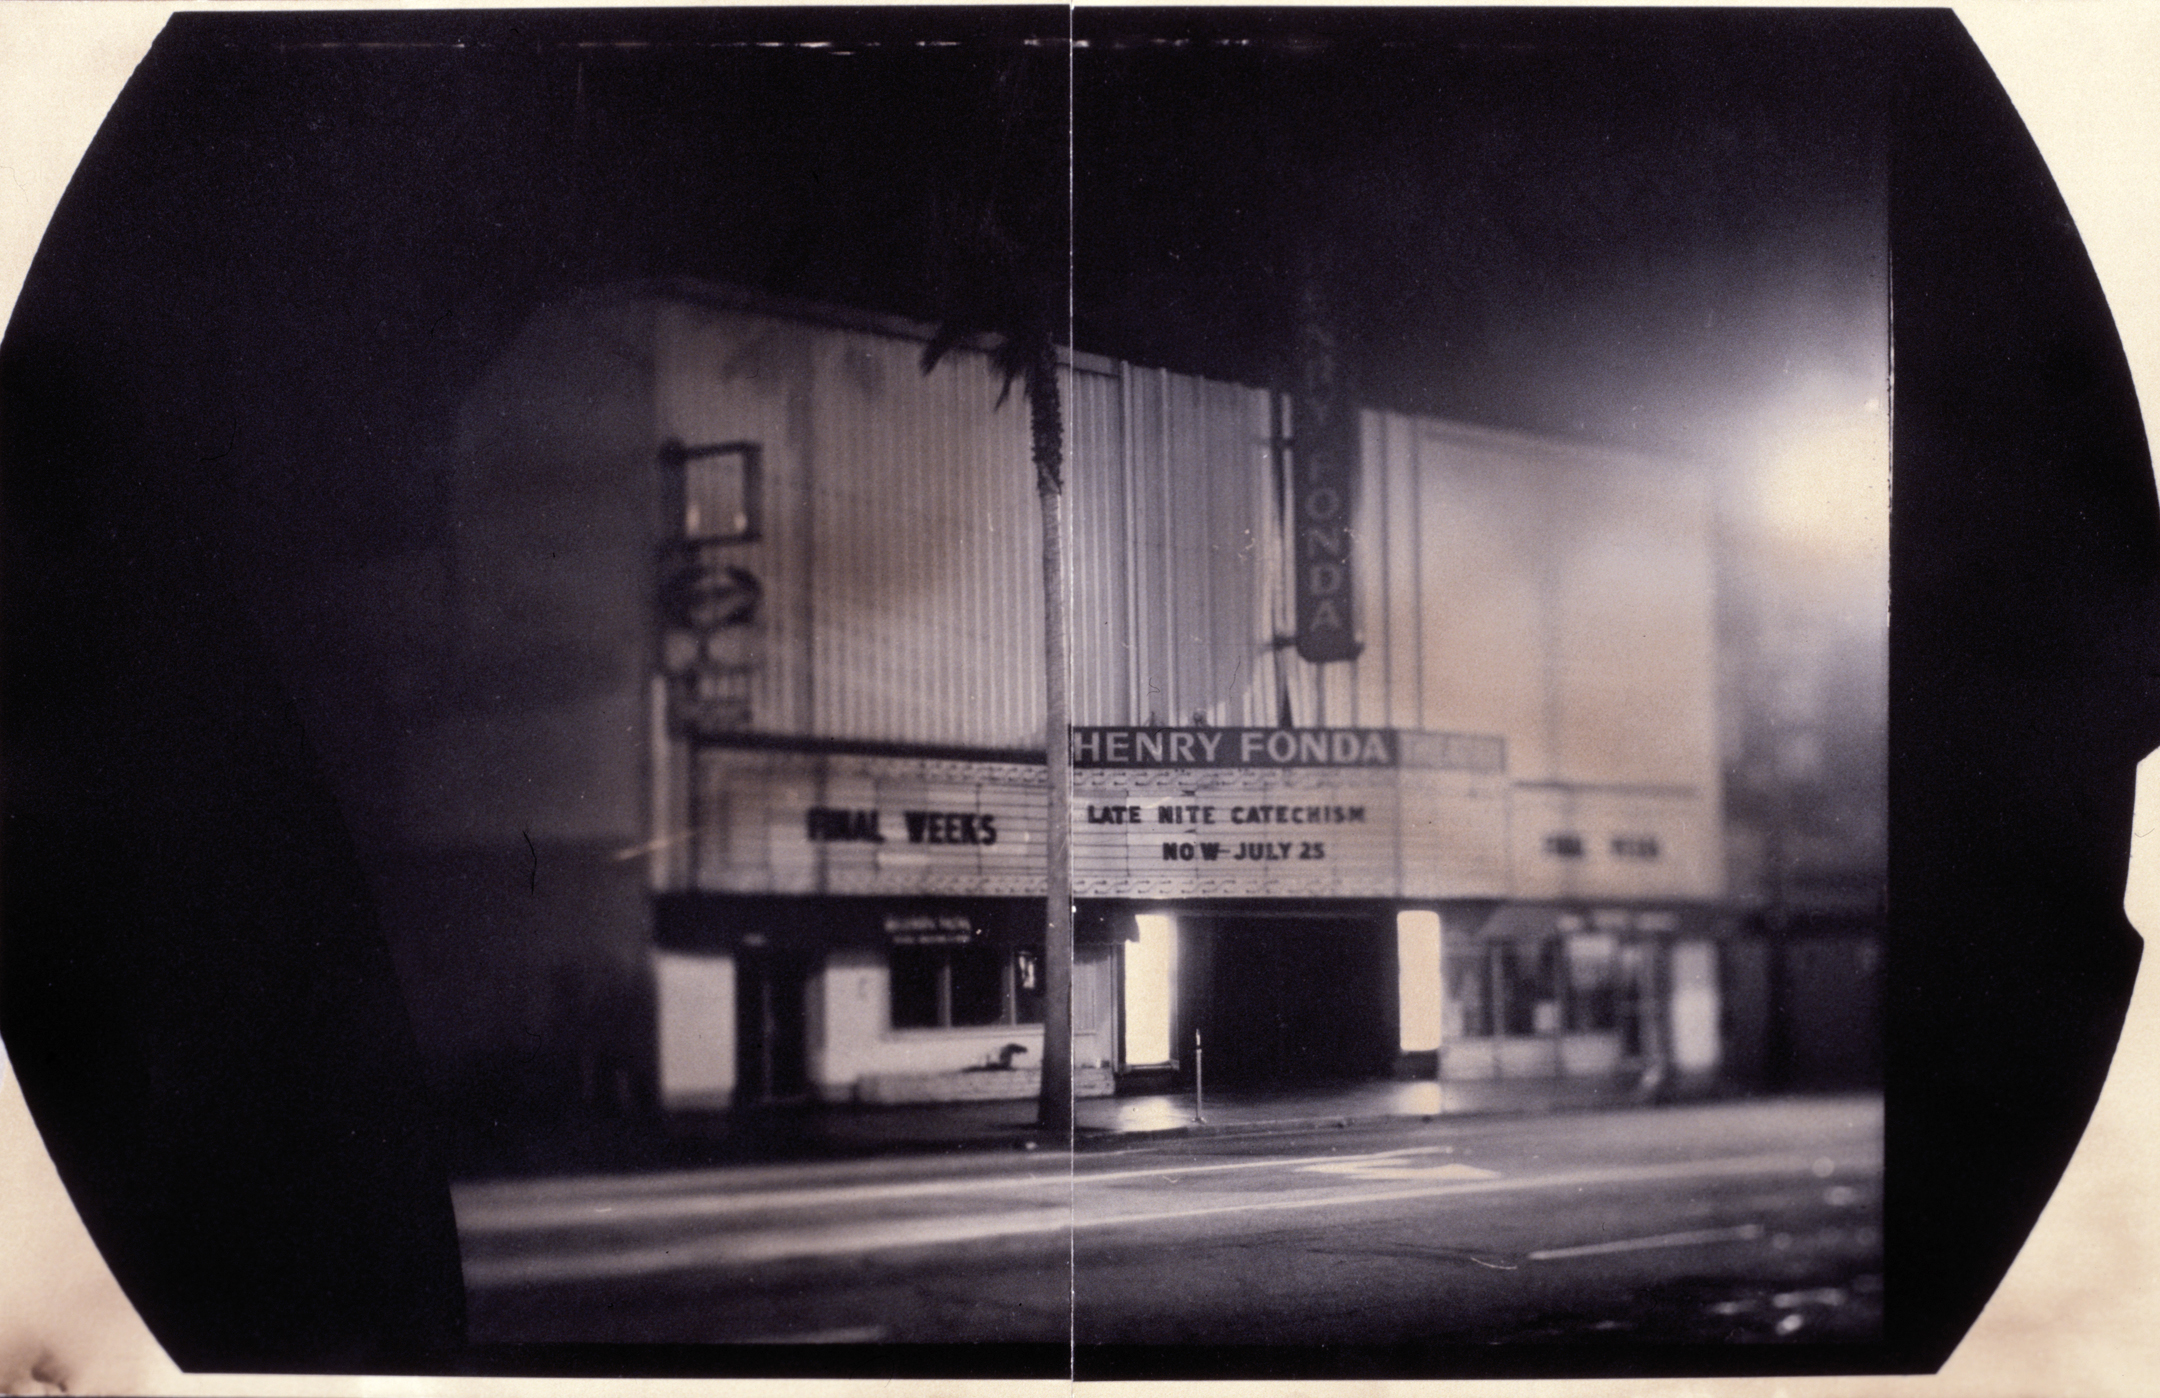 12.henry fonda theatre.jpg